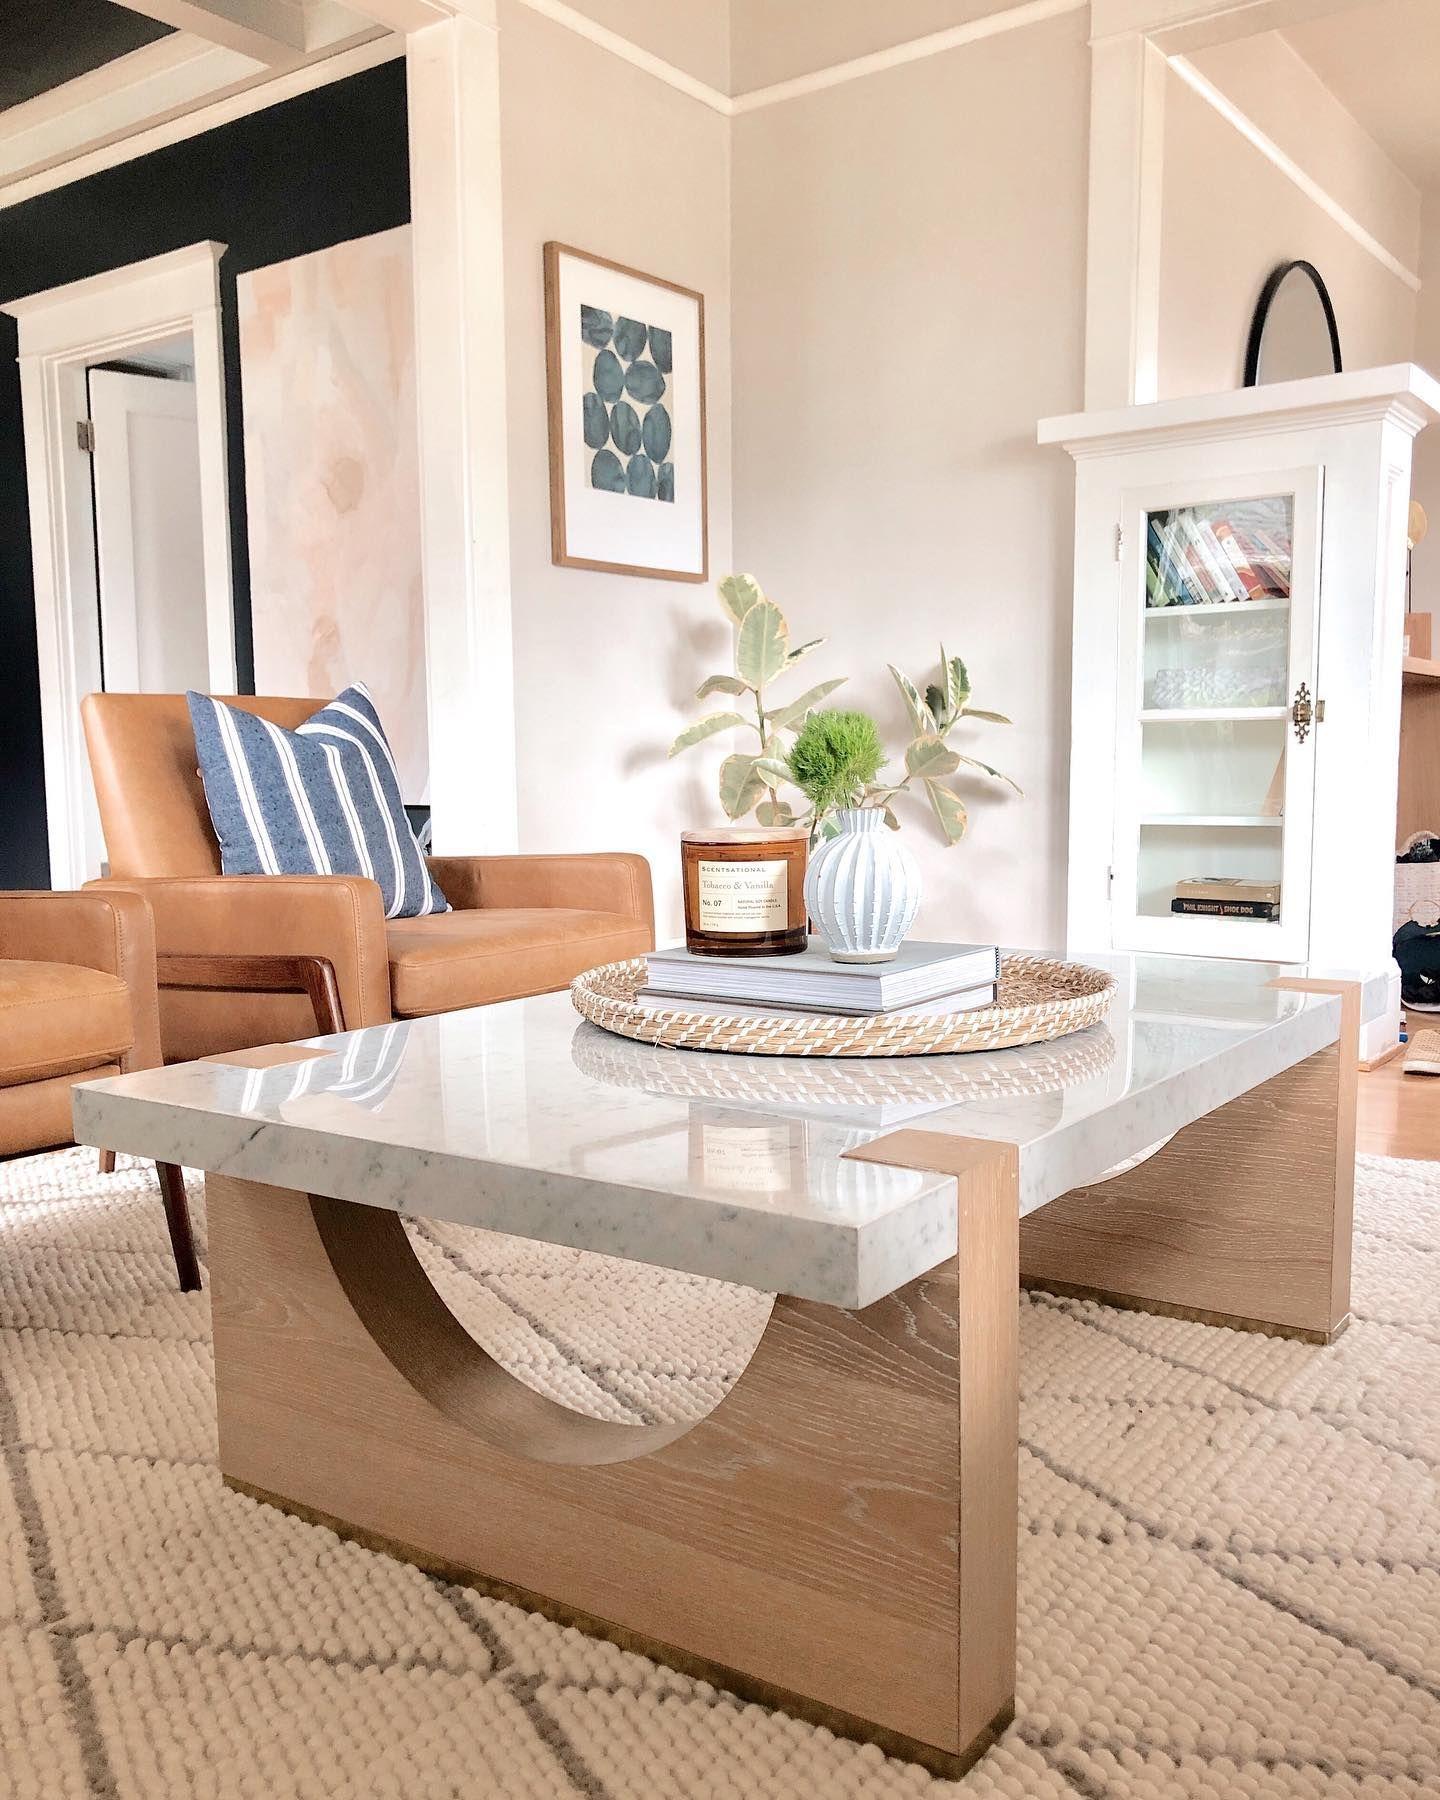 Home Furnishings, Rugs, Living